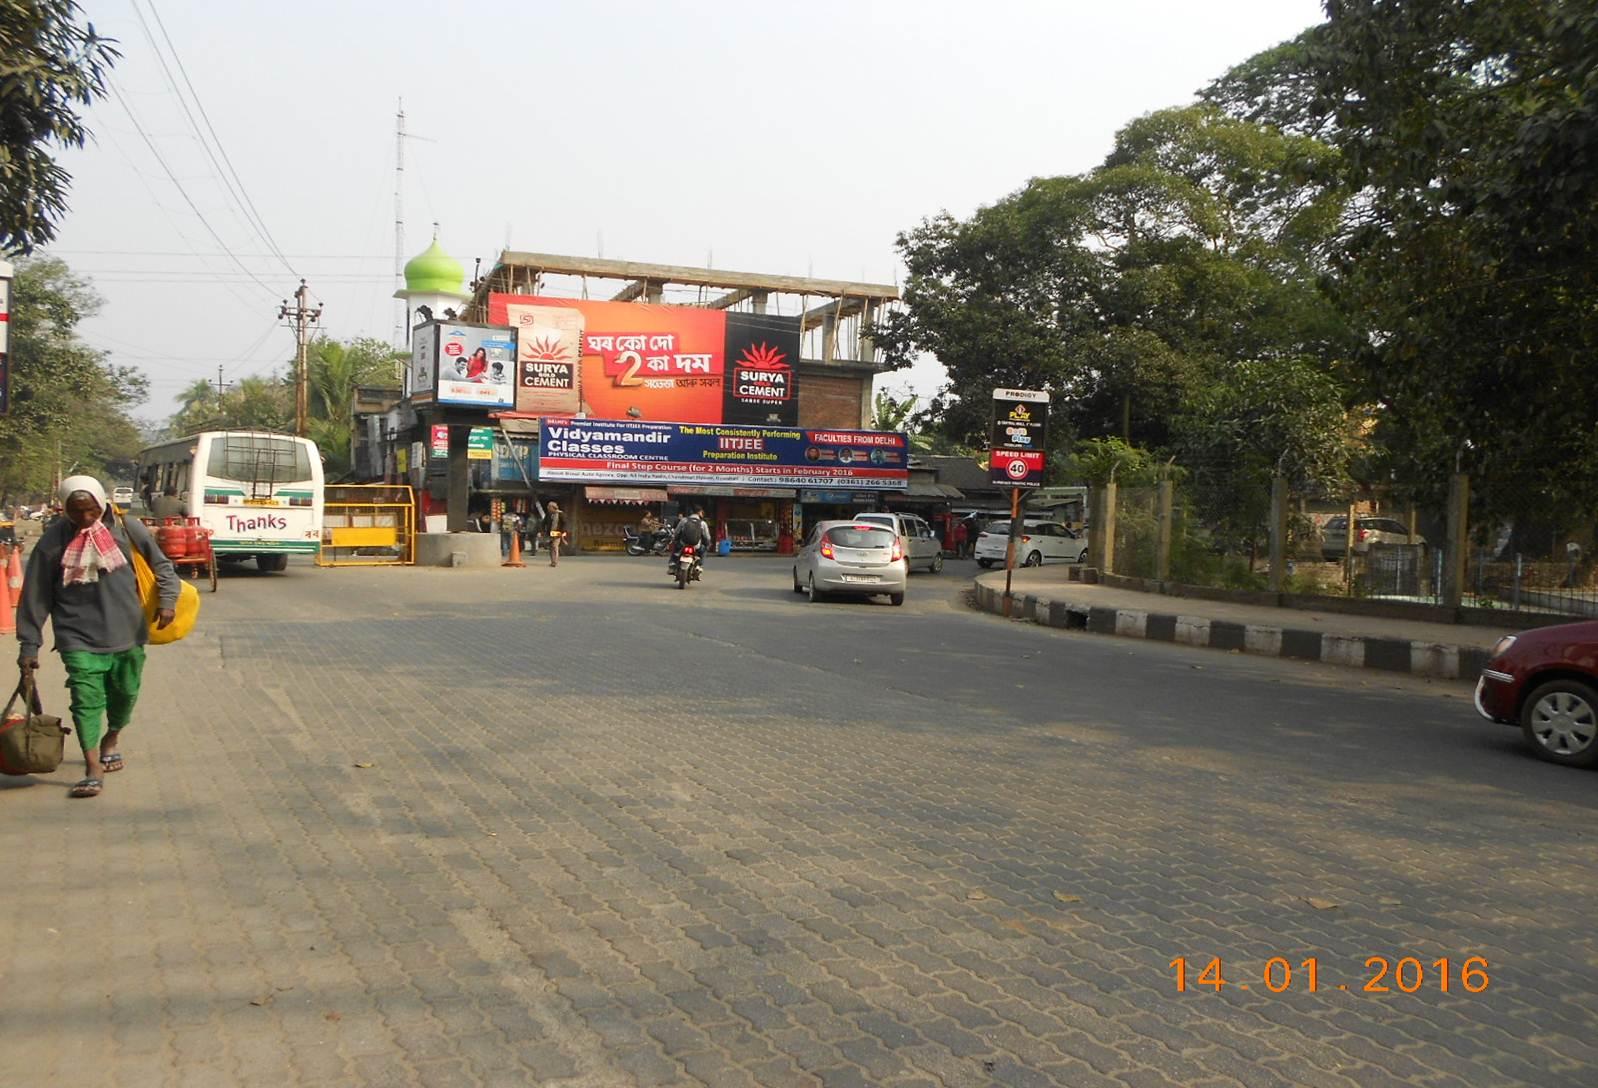 Dighliphukri high court, Guwahati